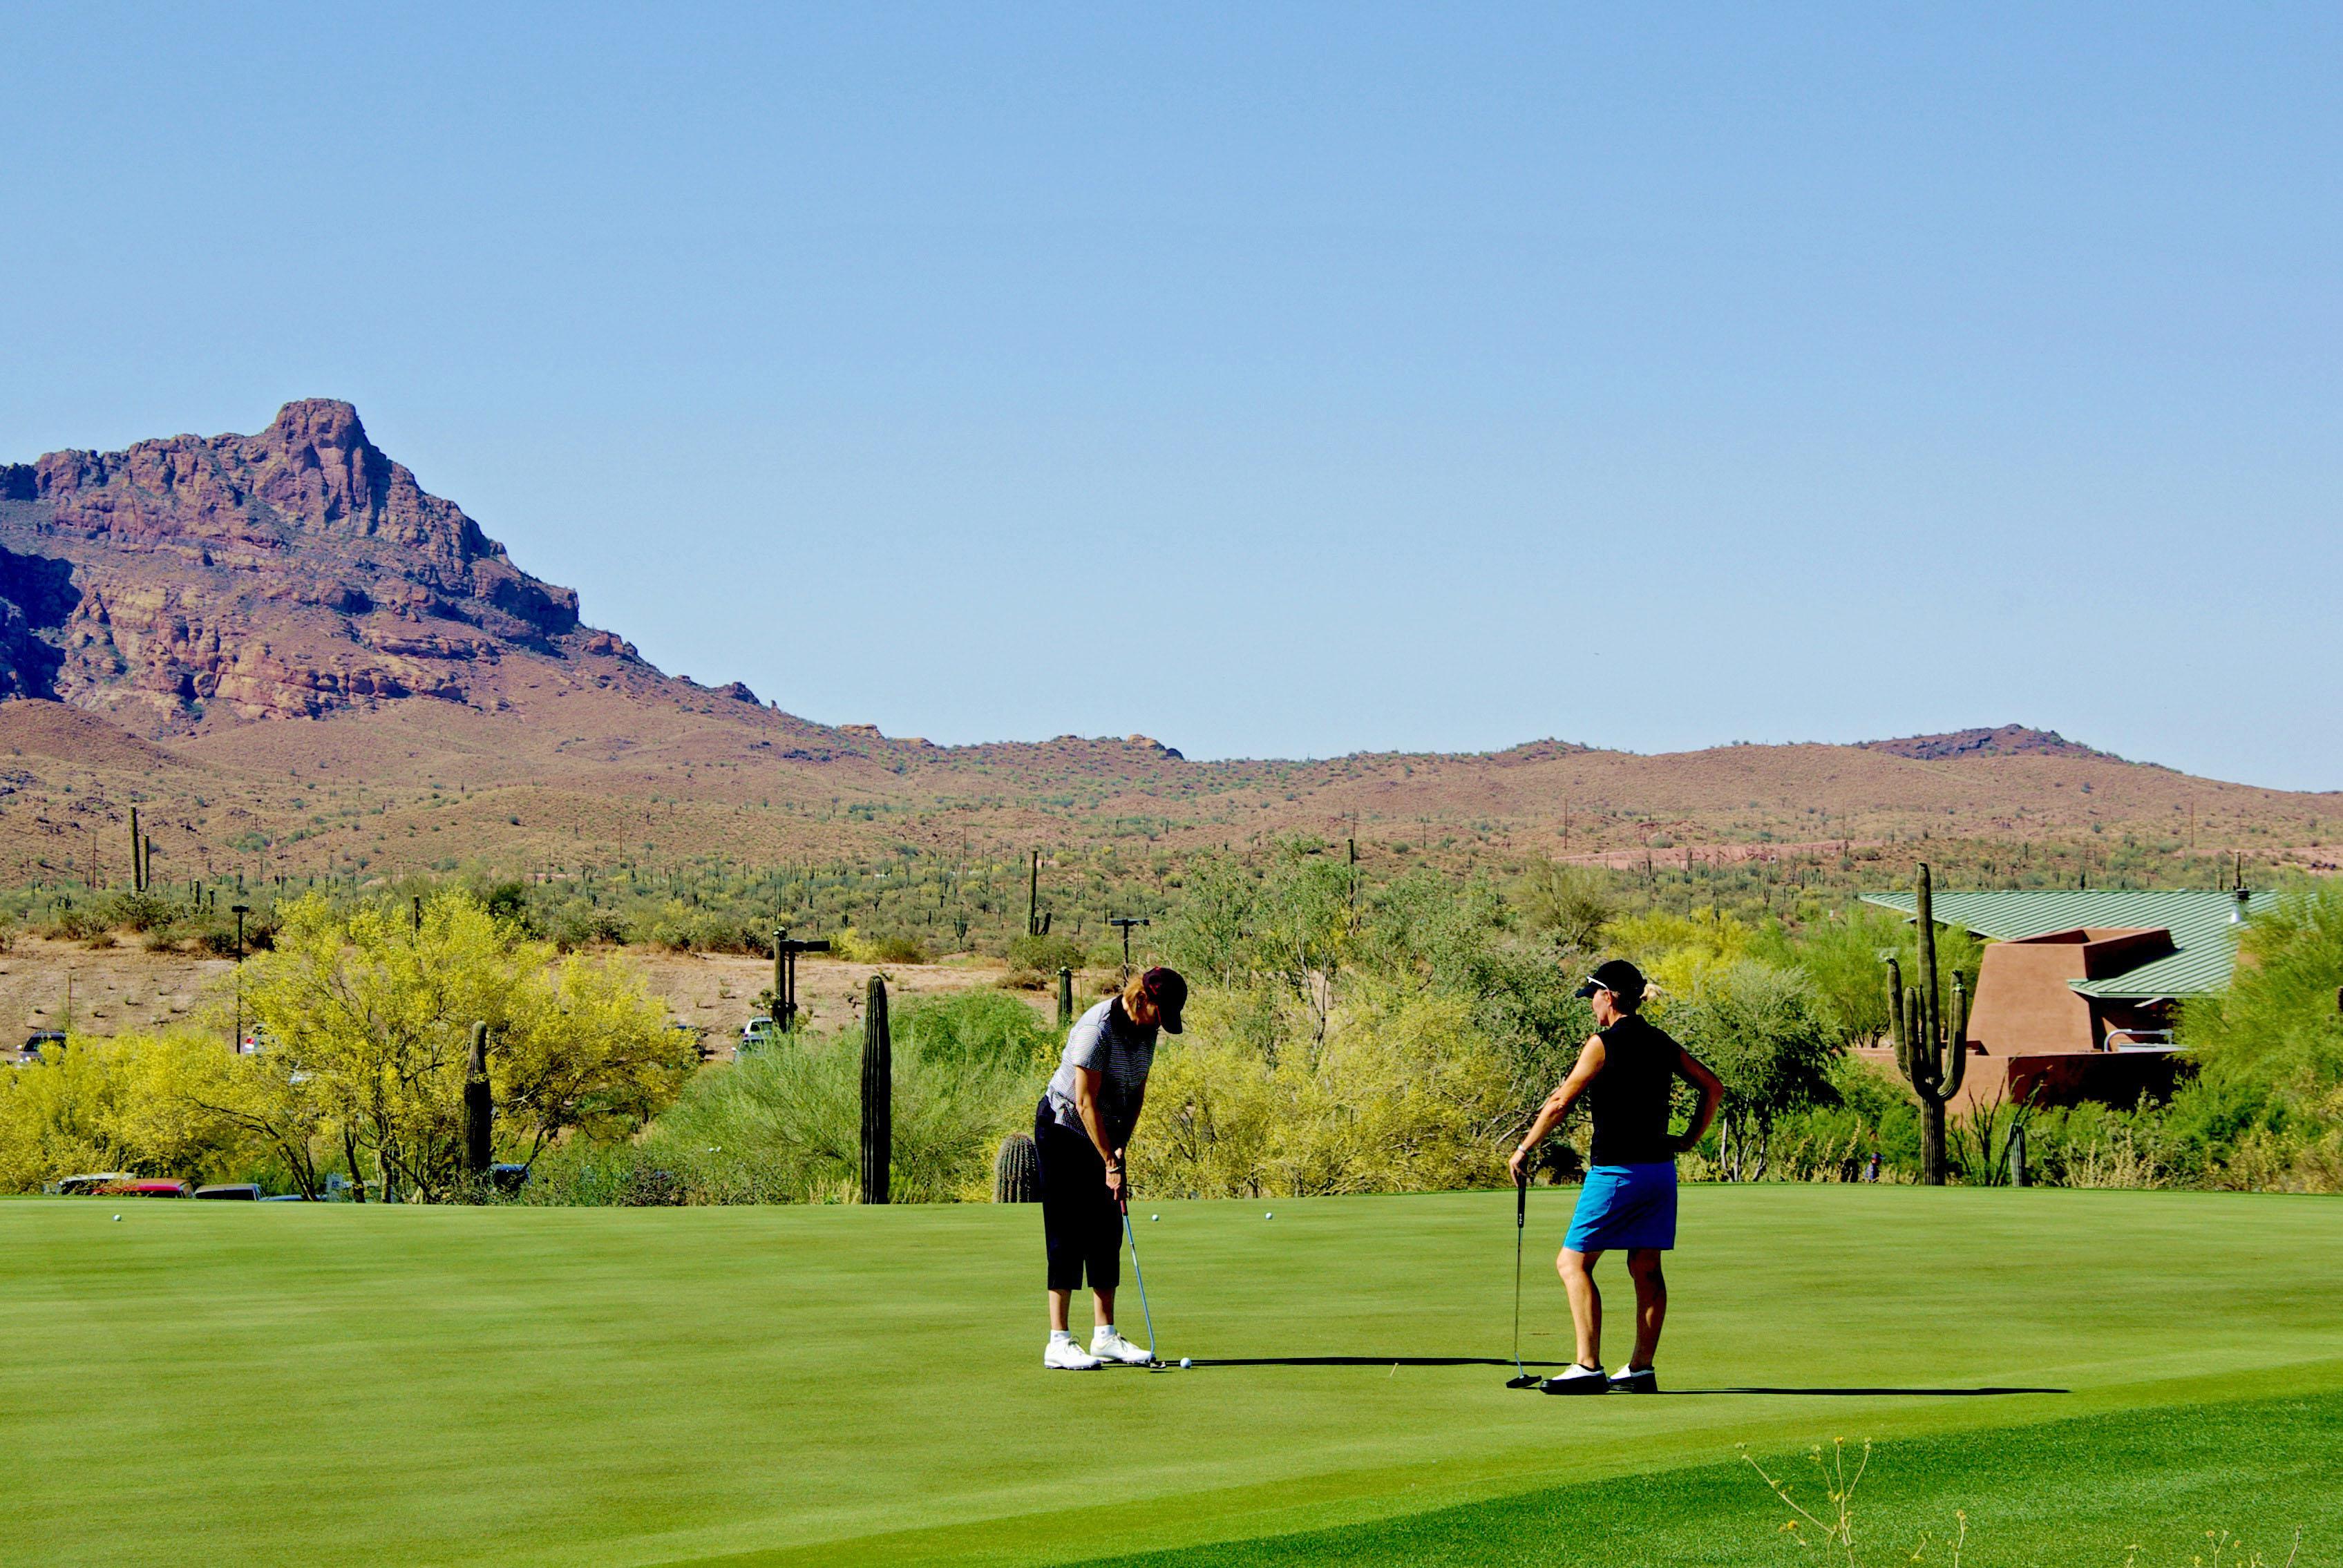 Mcdowell Mountain Golf Course Tour